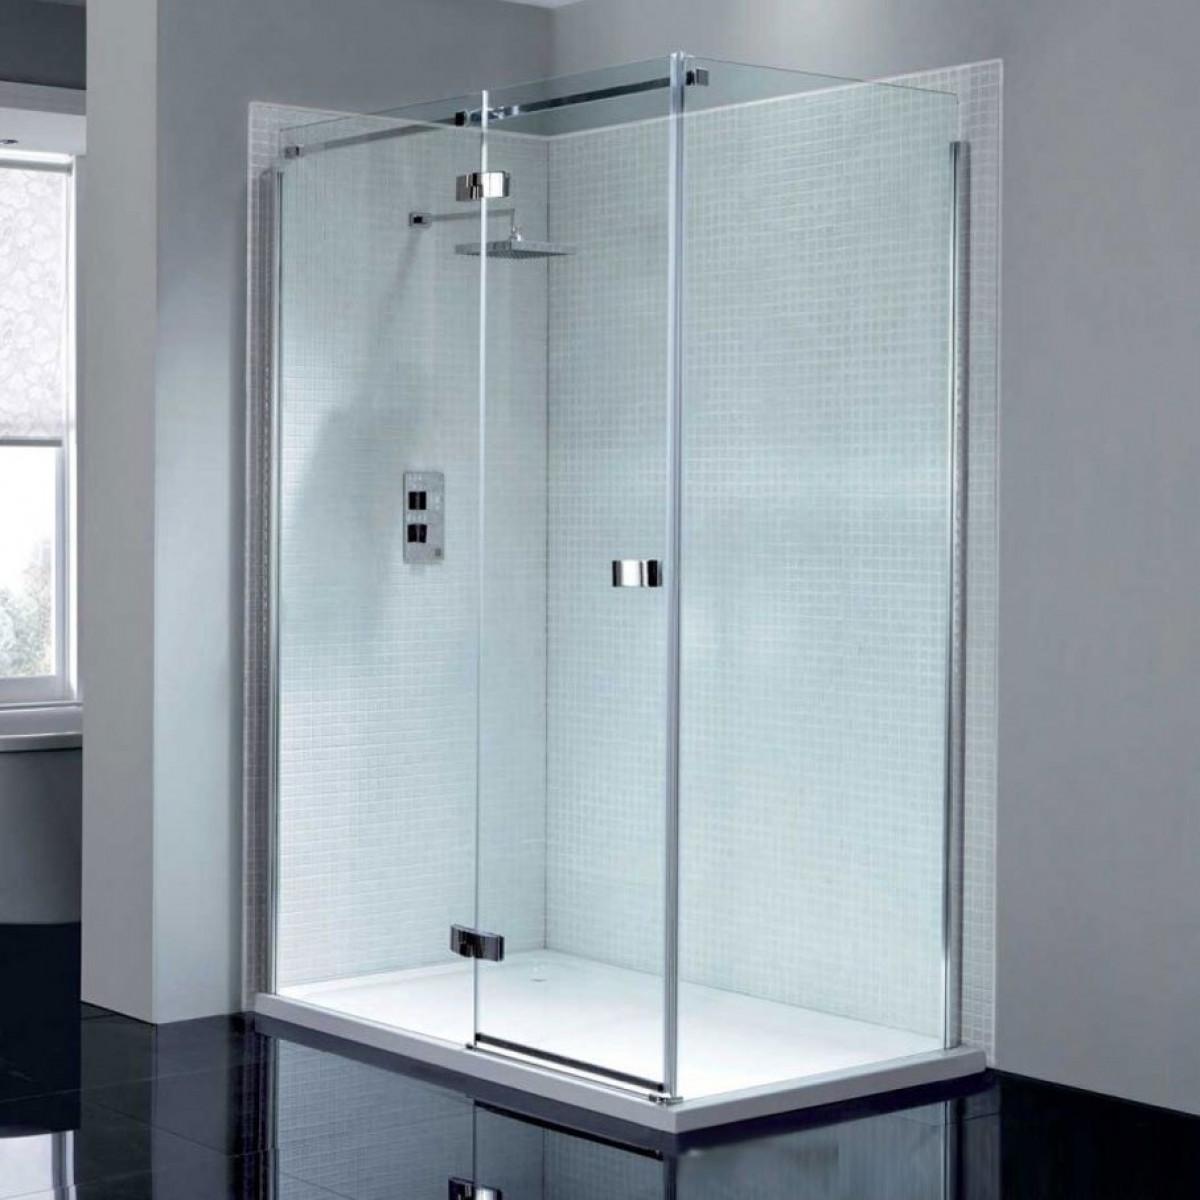 April prestige2 frameless 1000mm hinge shower door with in for 1000mm pivot shower door